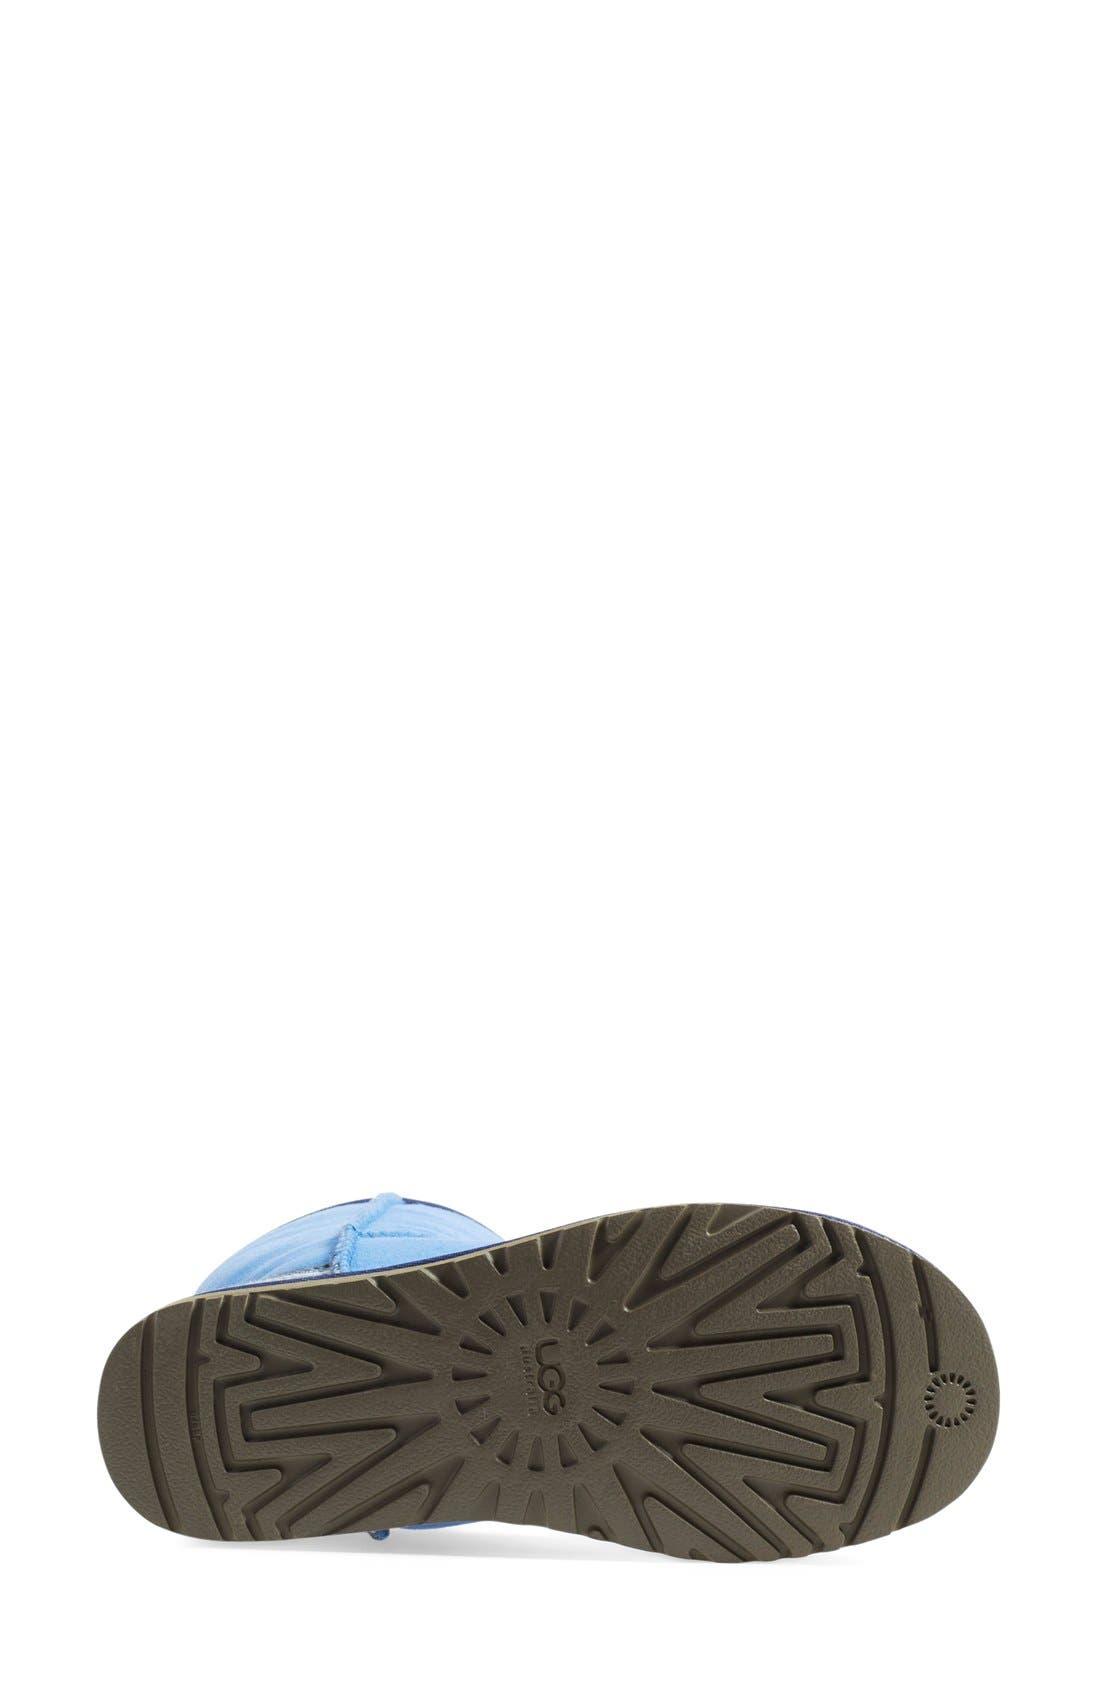 Alternate Image 4  - UGG® 'Classic Short - Serape' Water Resistant Boot (Women)